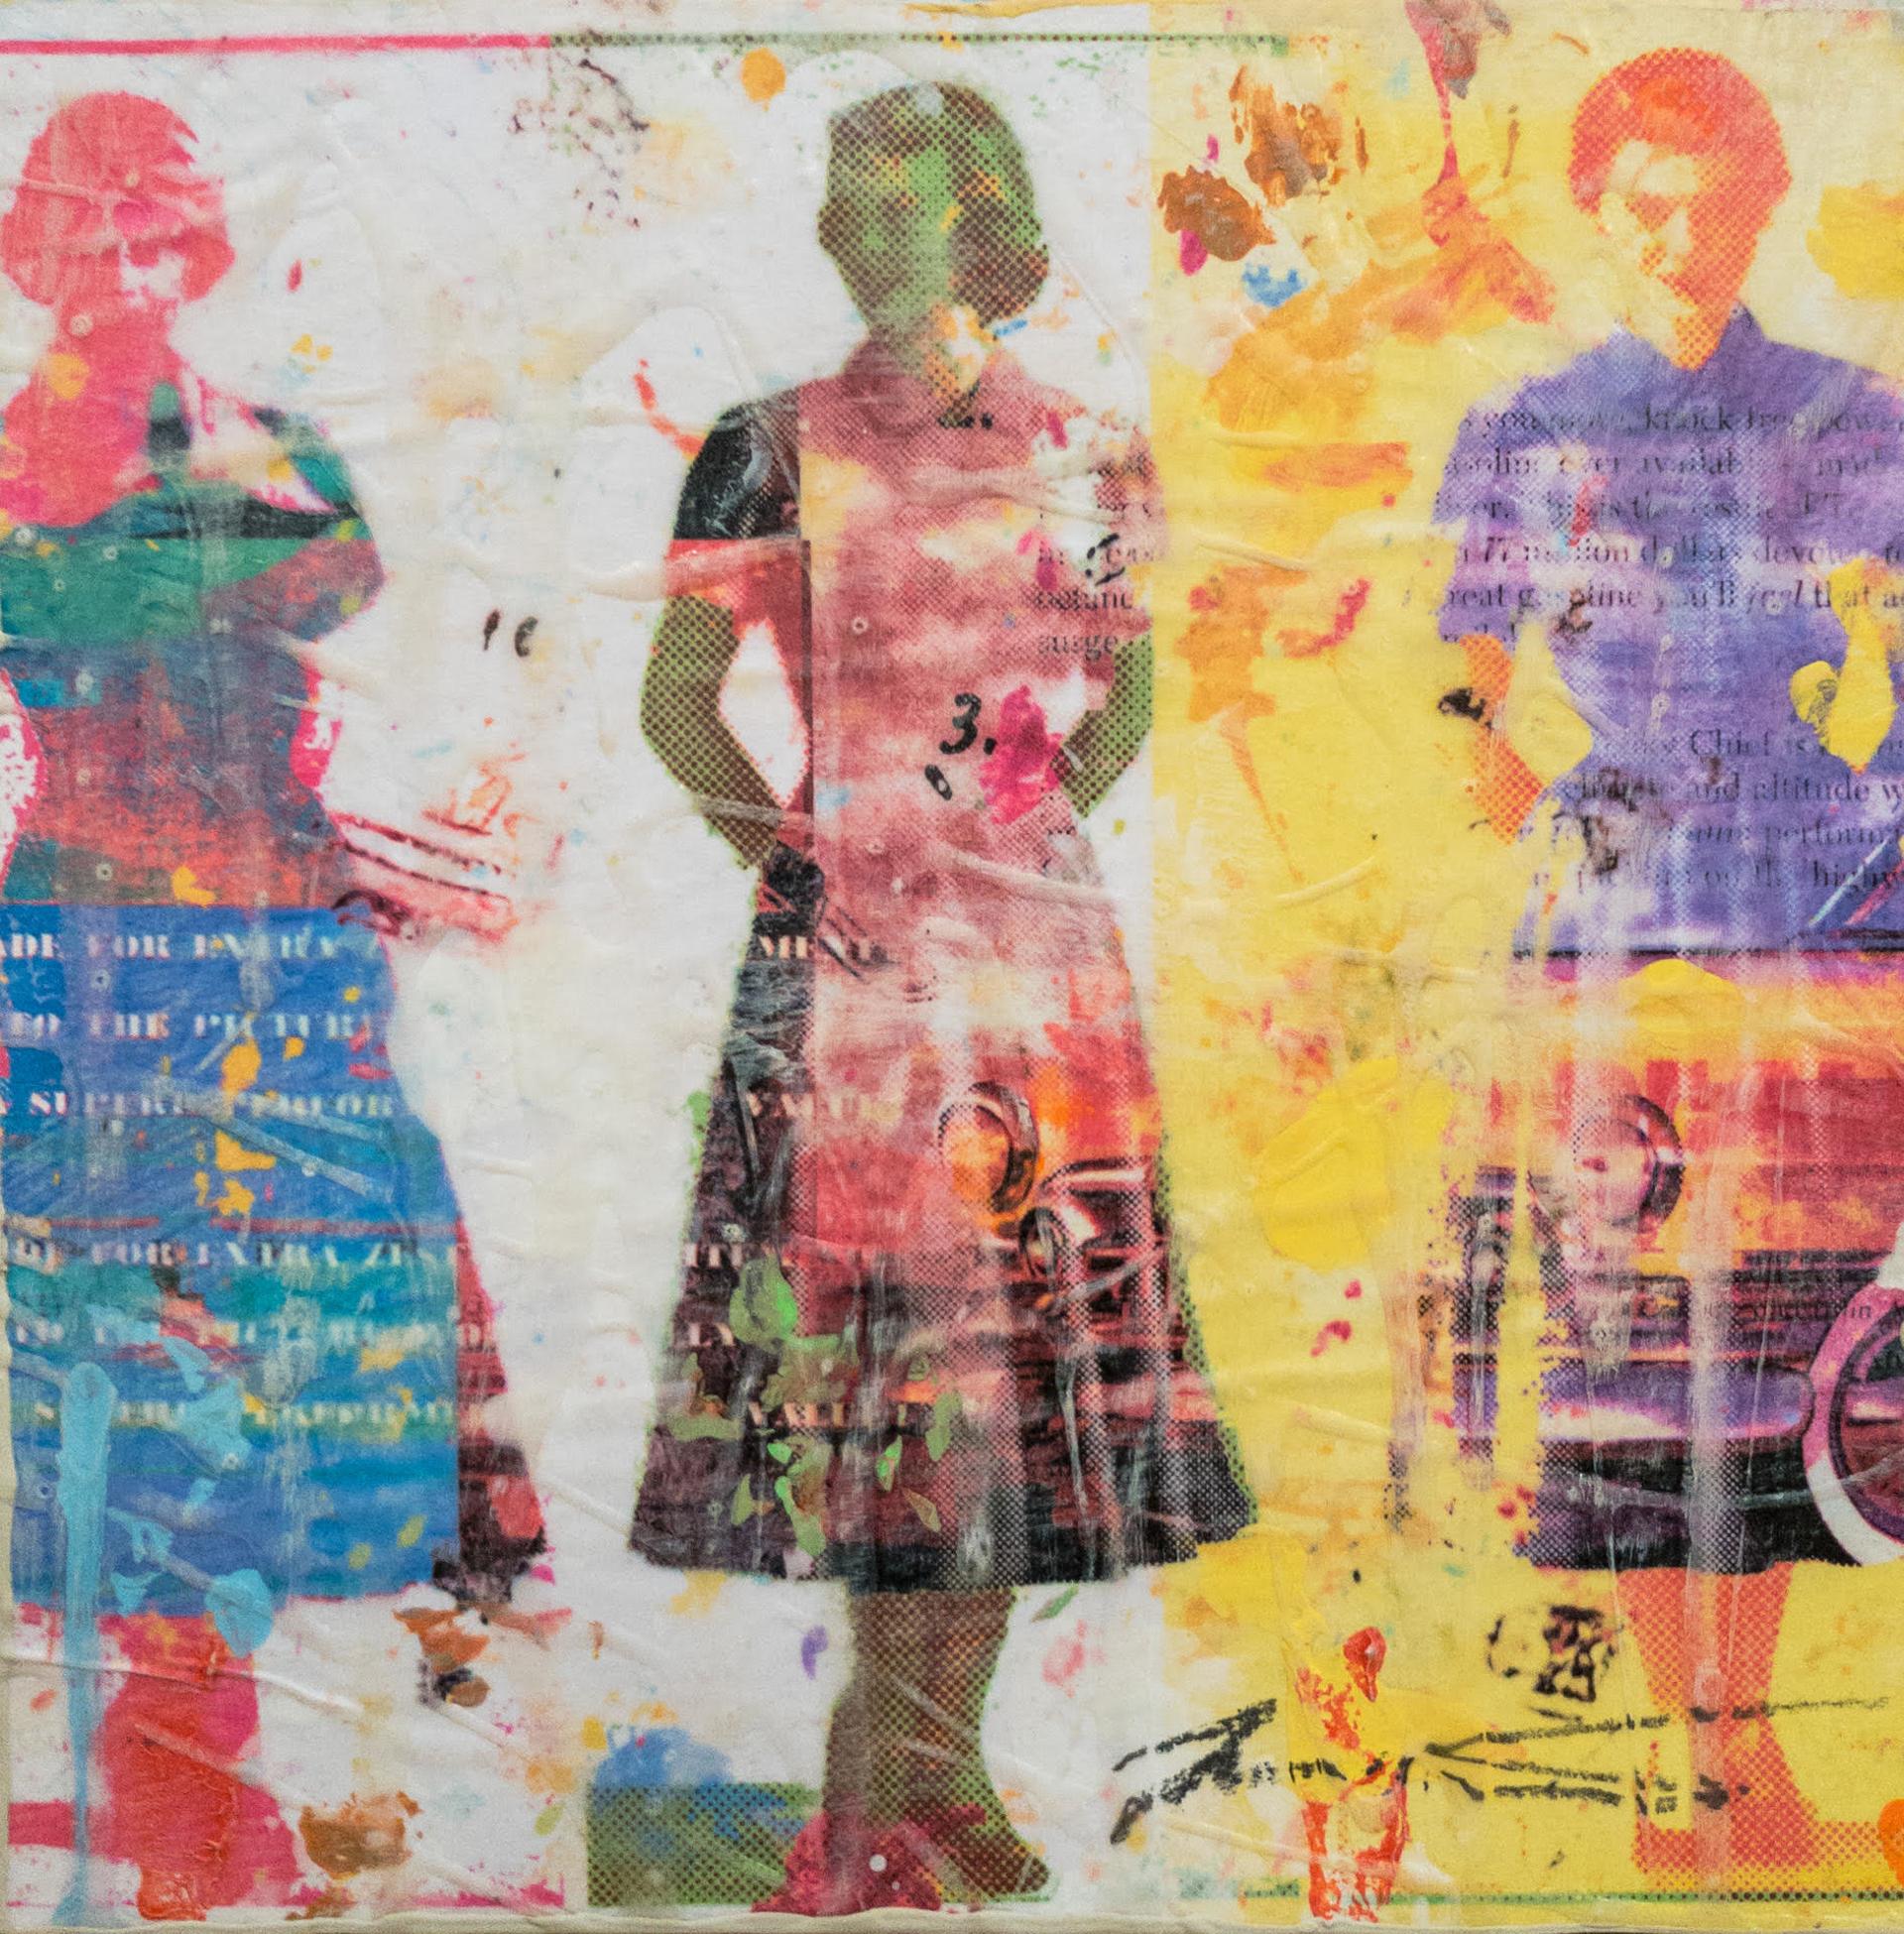 Dress Paper VI by Jon Davenport